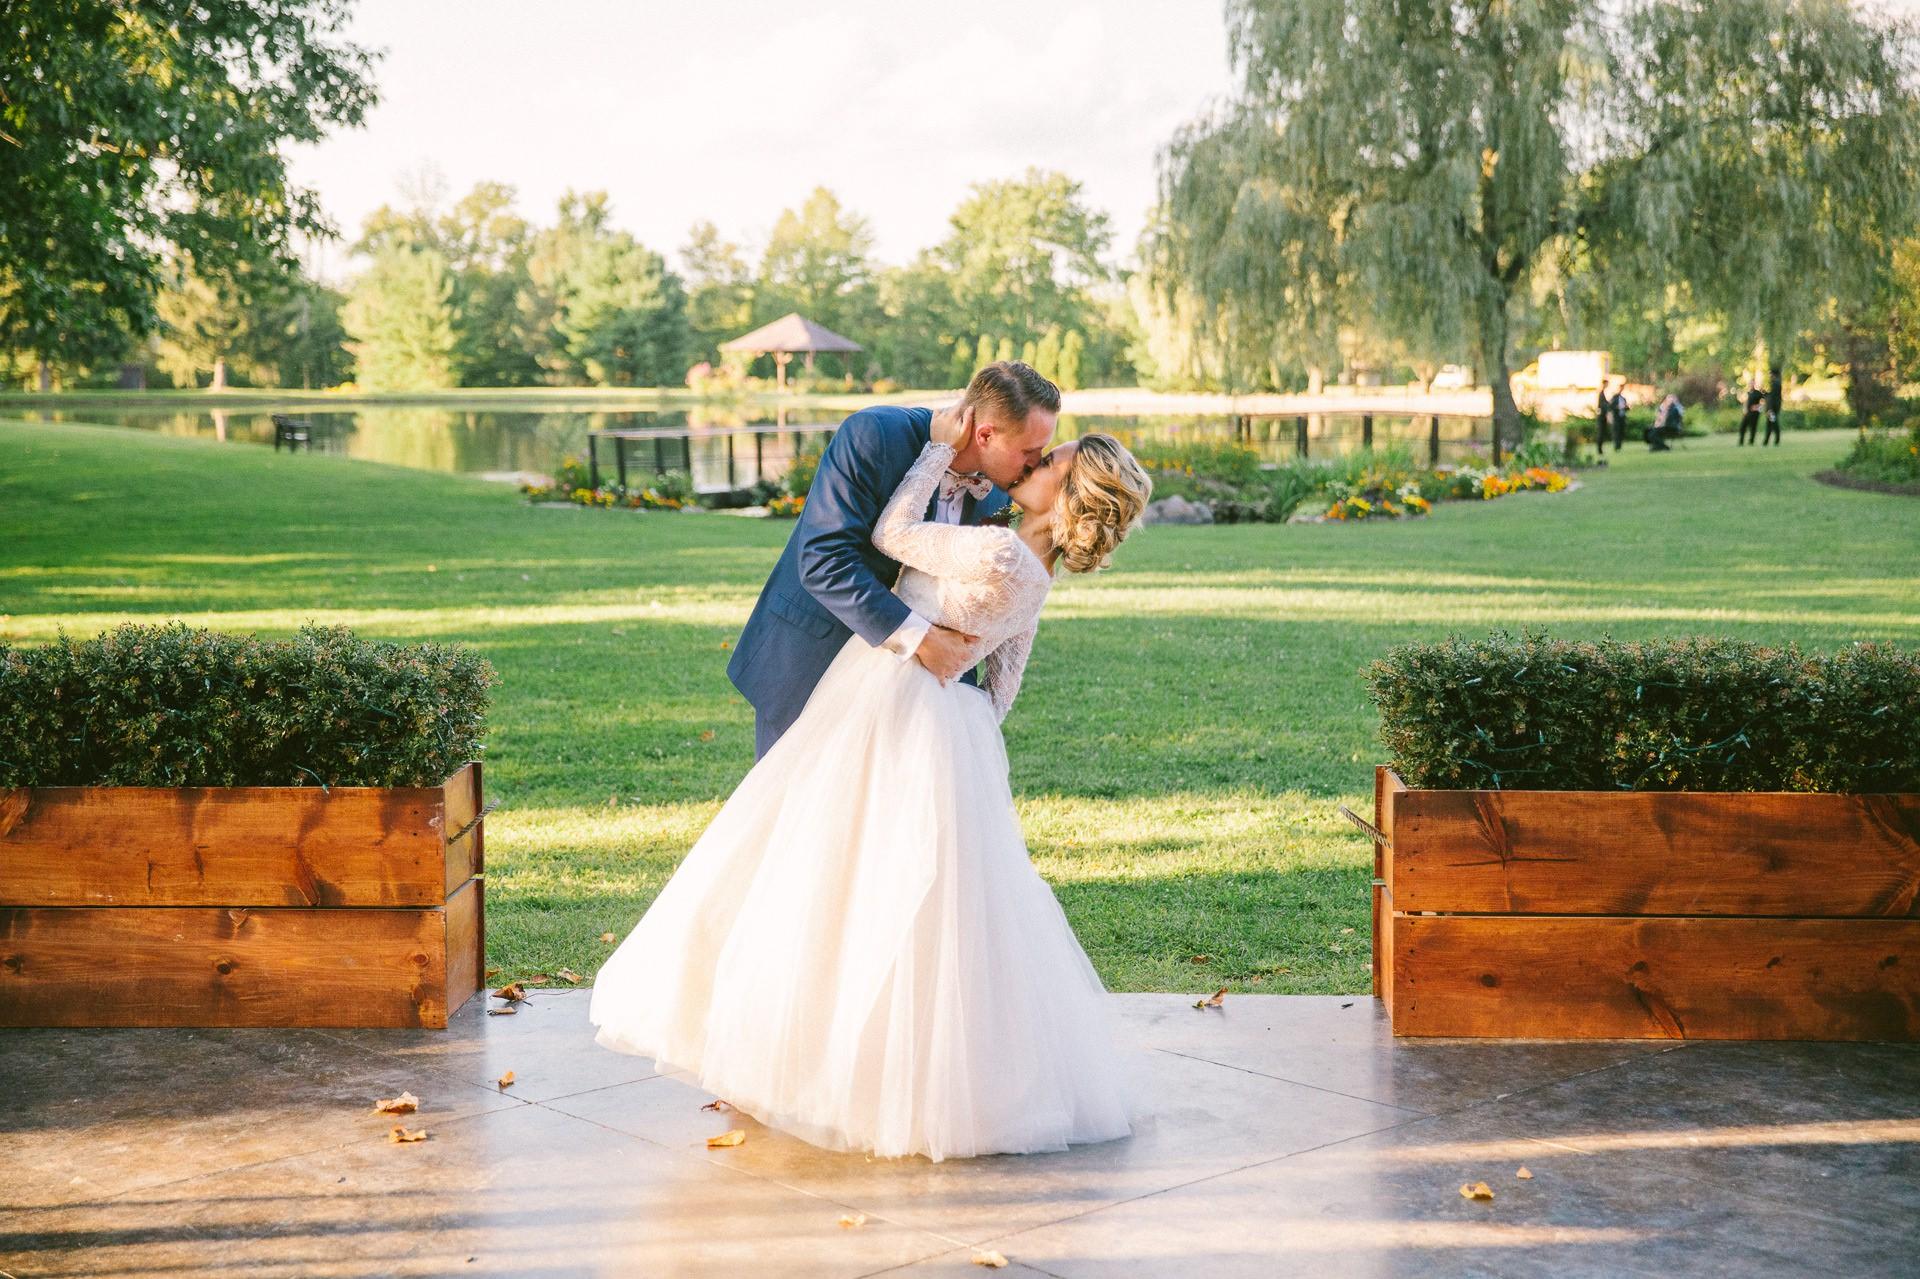 Meadow Ridge Farm Wedding Photos in Windsor 3 8.jpg